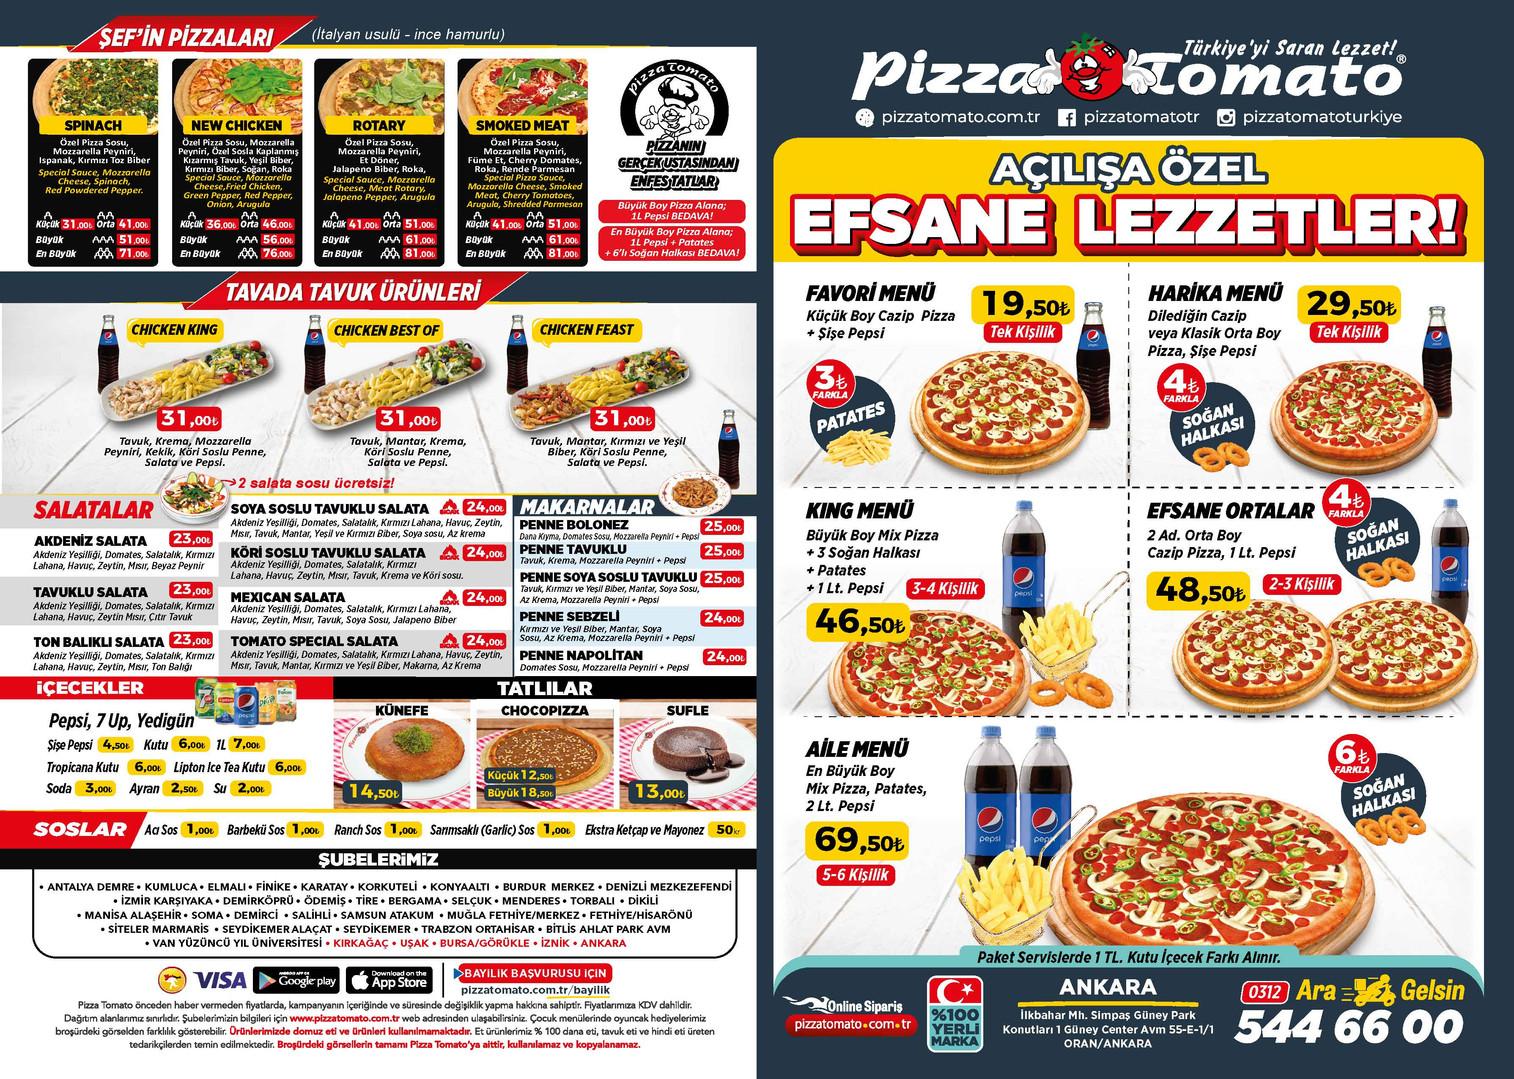 pizza-tomato-ankara-oran-kampanya.jpg